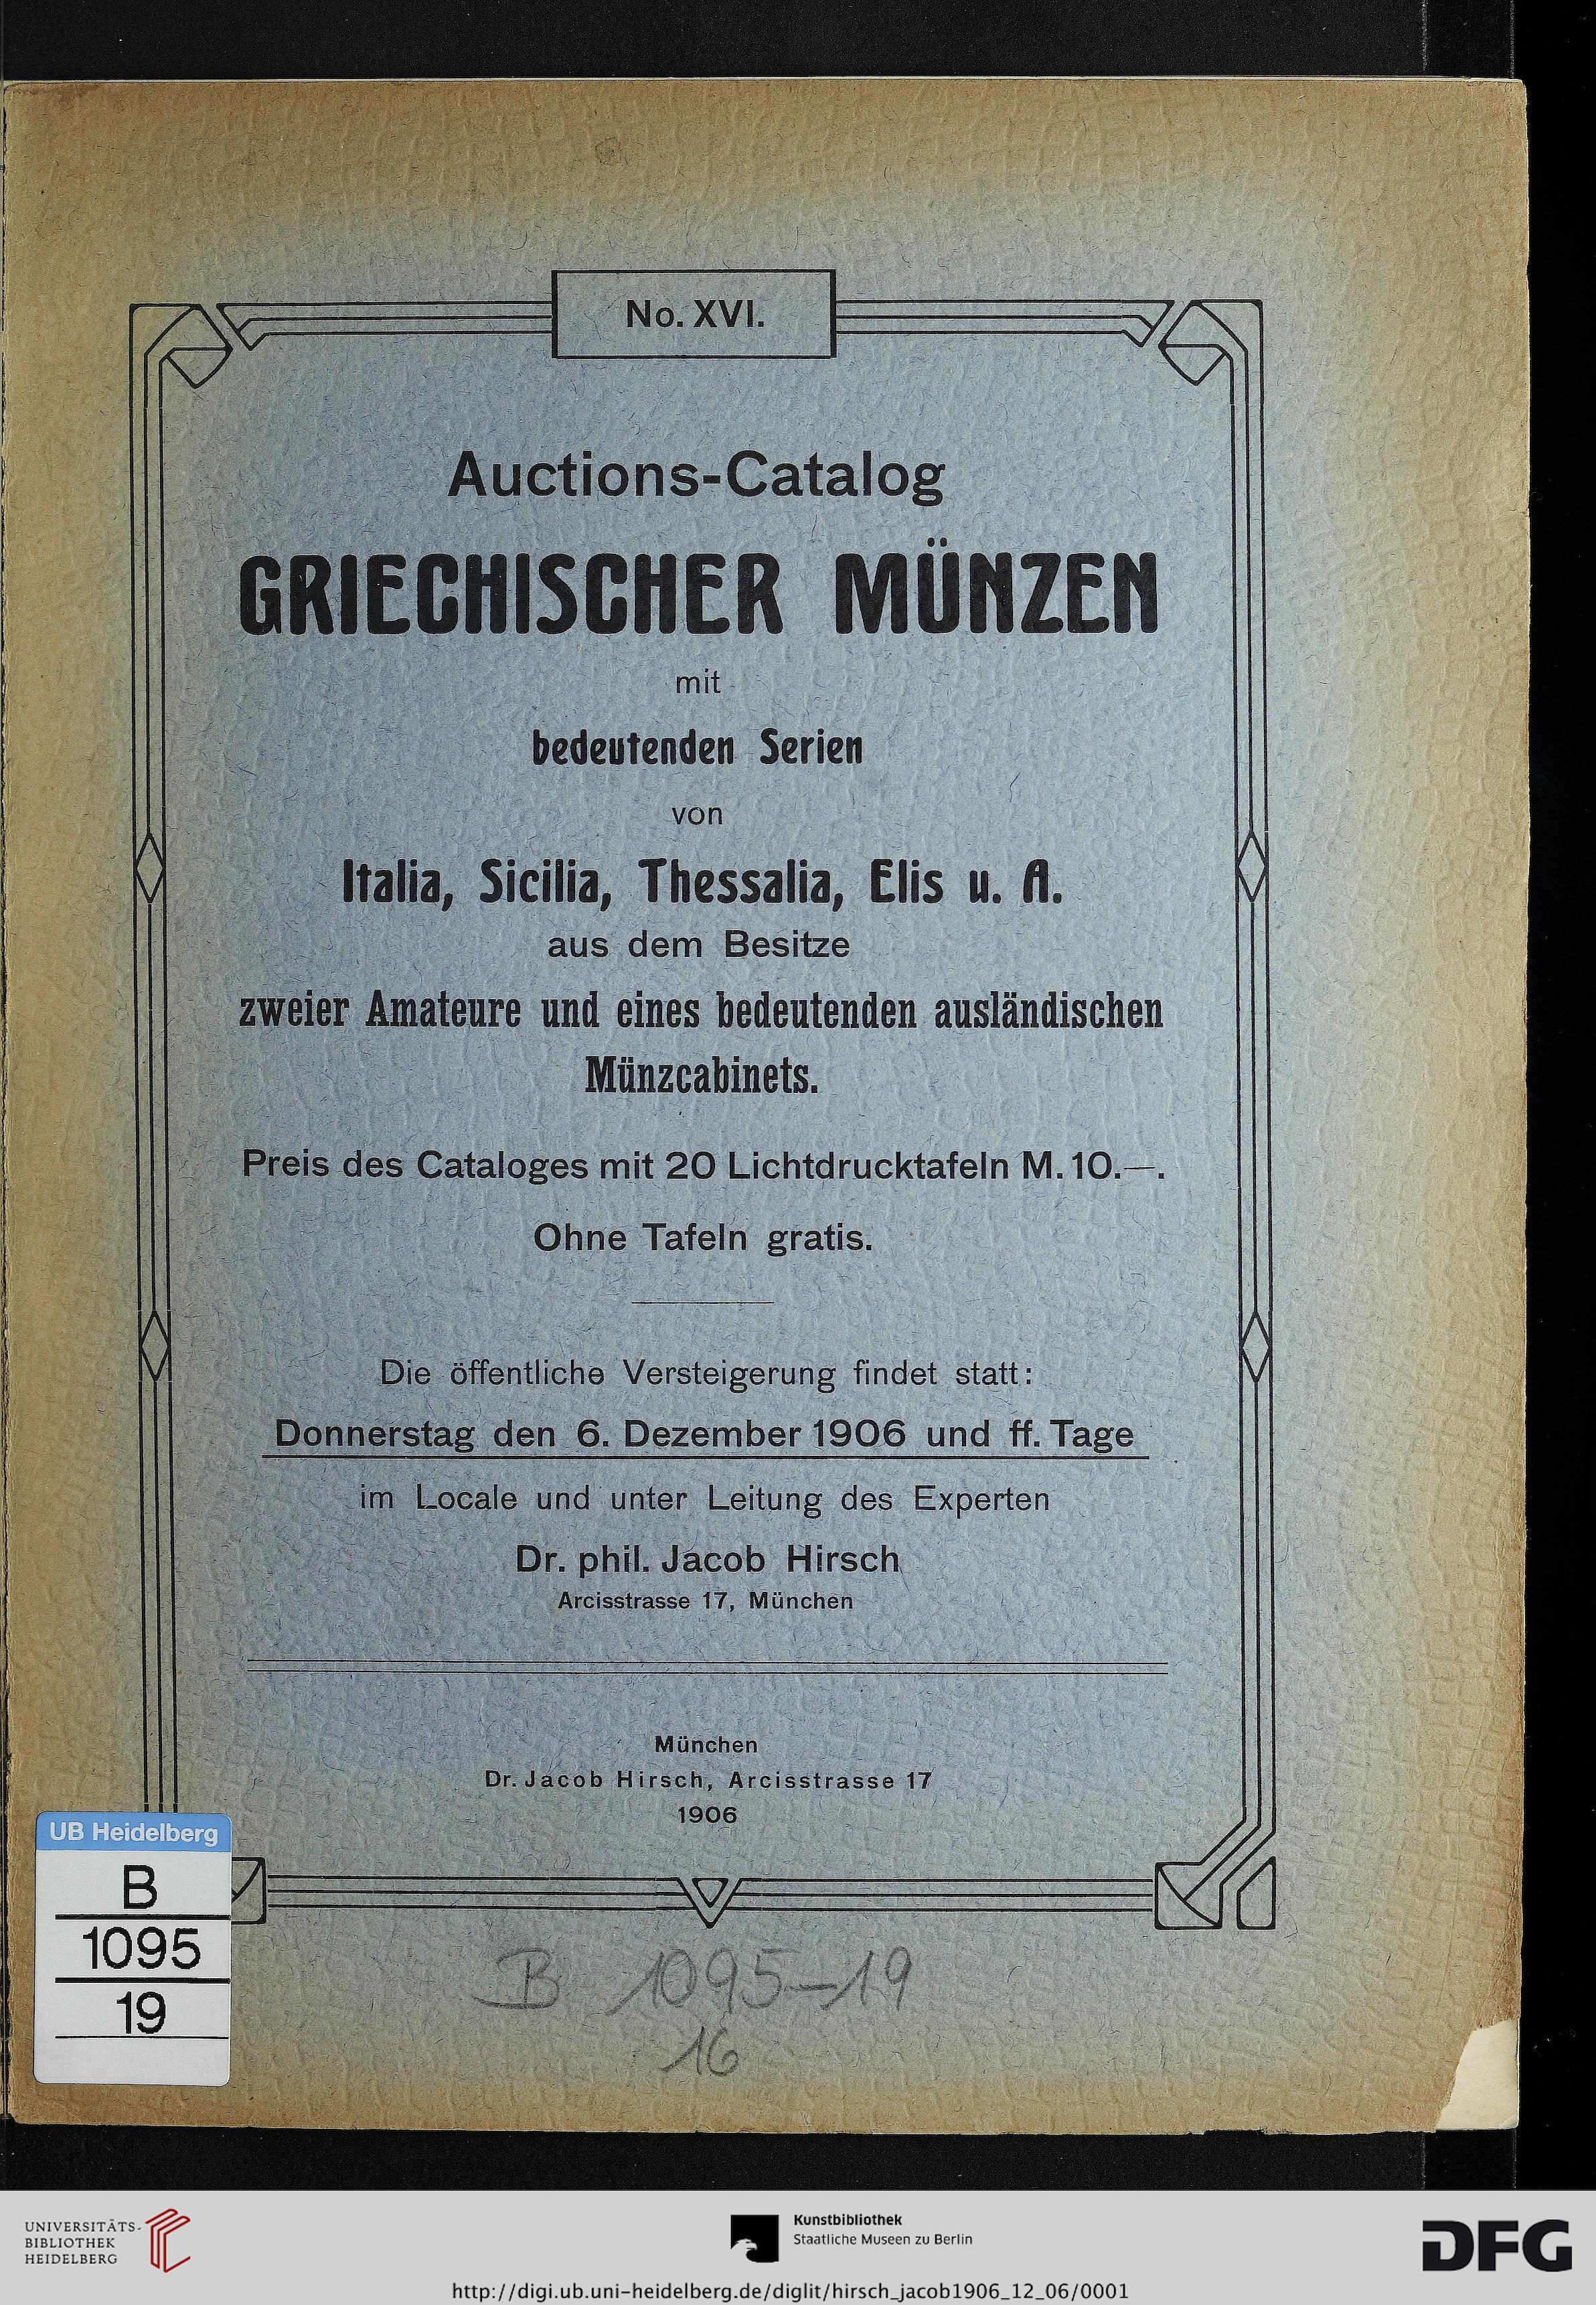 Jacob Hirsch München Hrsg Auctions Catalog Griechischer Münzen